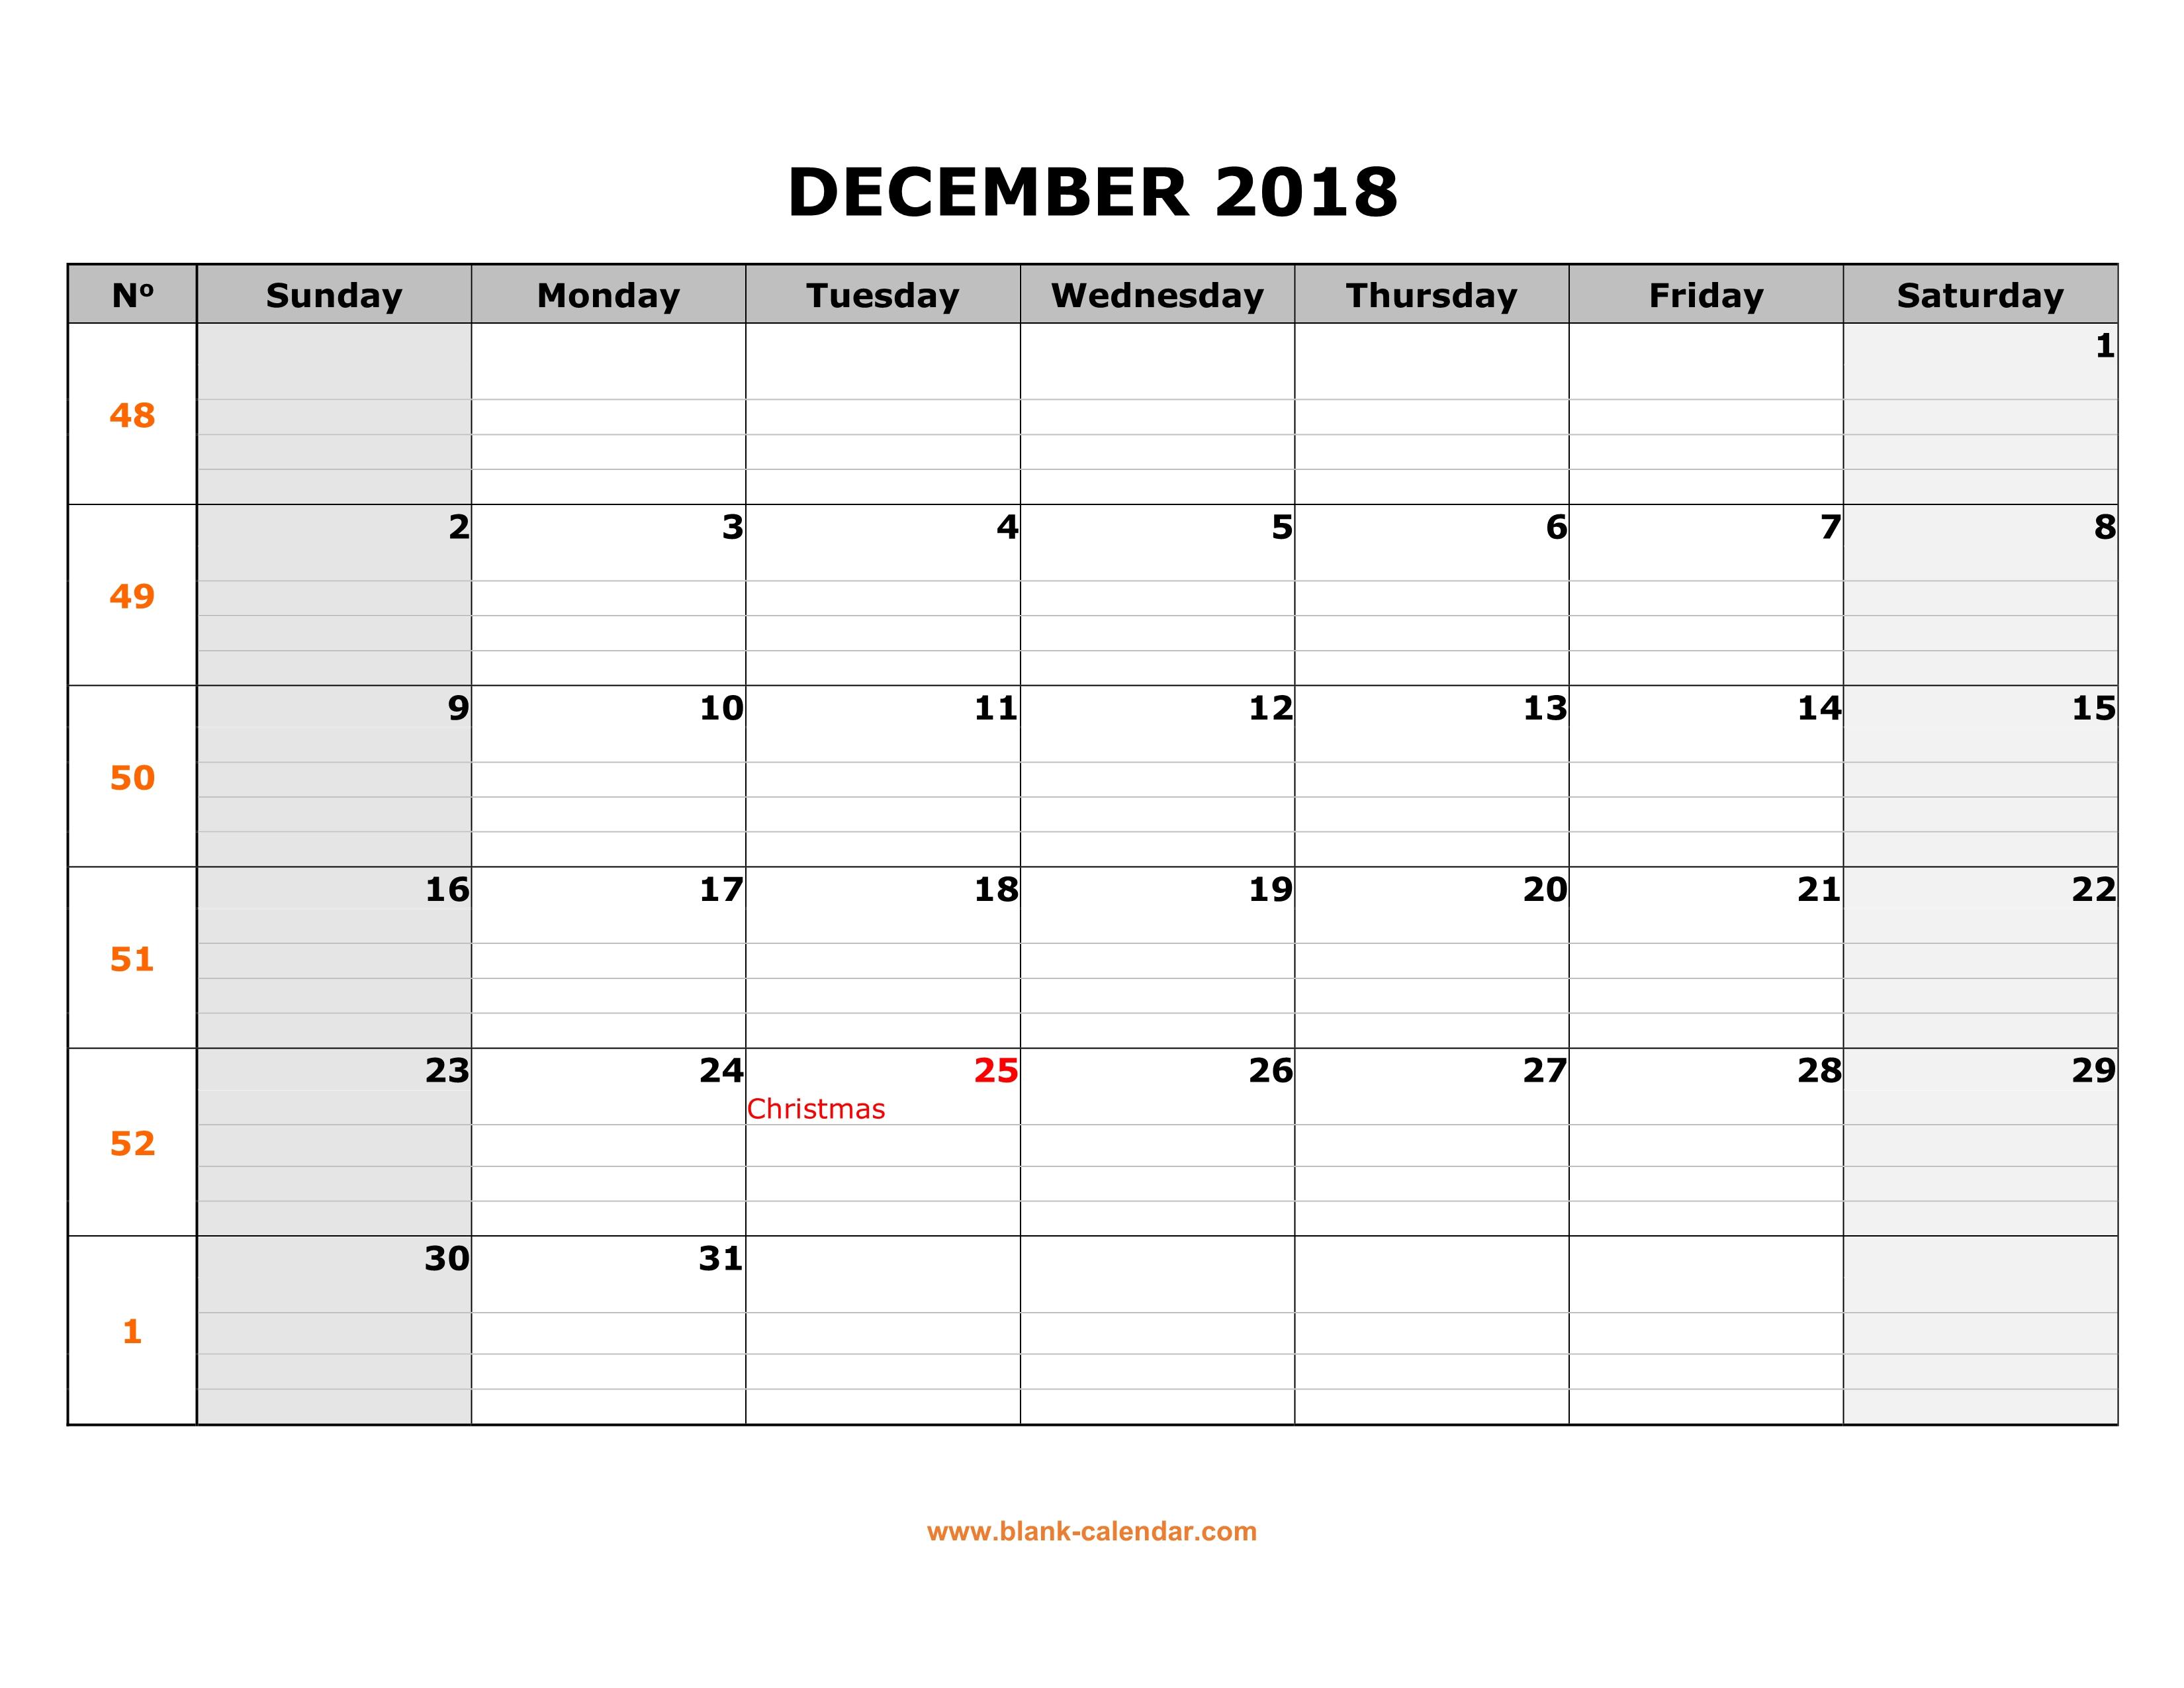 Free Download Printable December 2018 Calendar, Large Box Grid within Blank Calendar Printable December